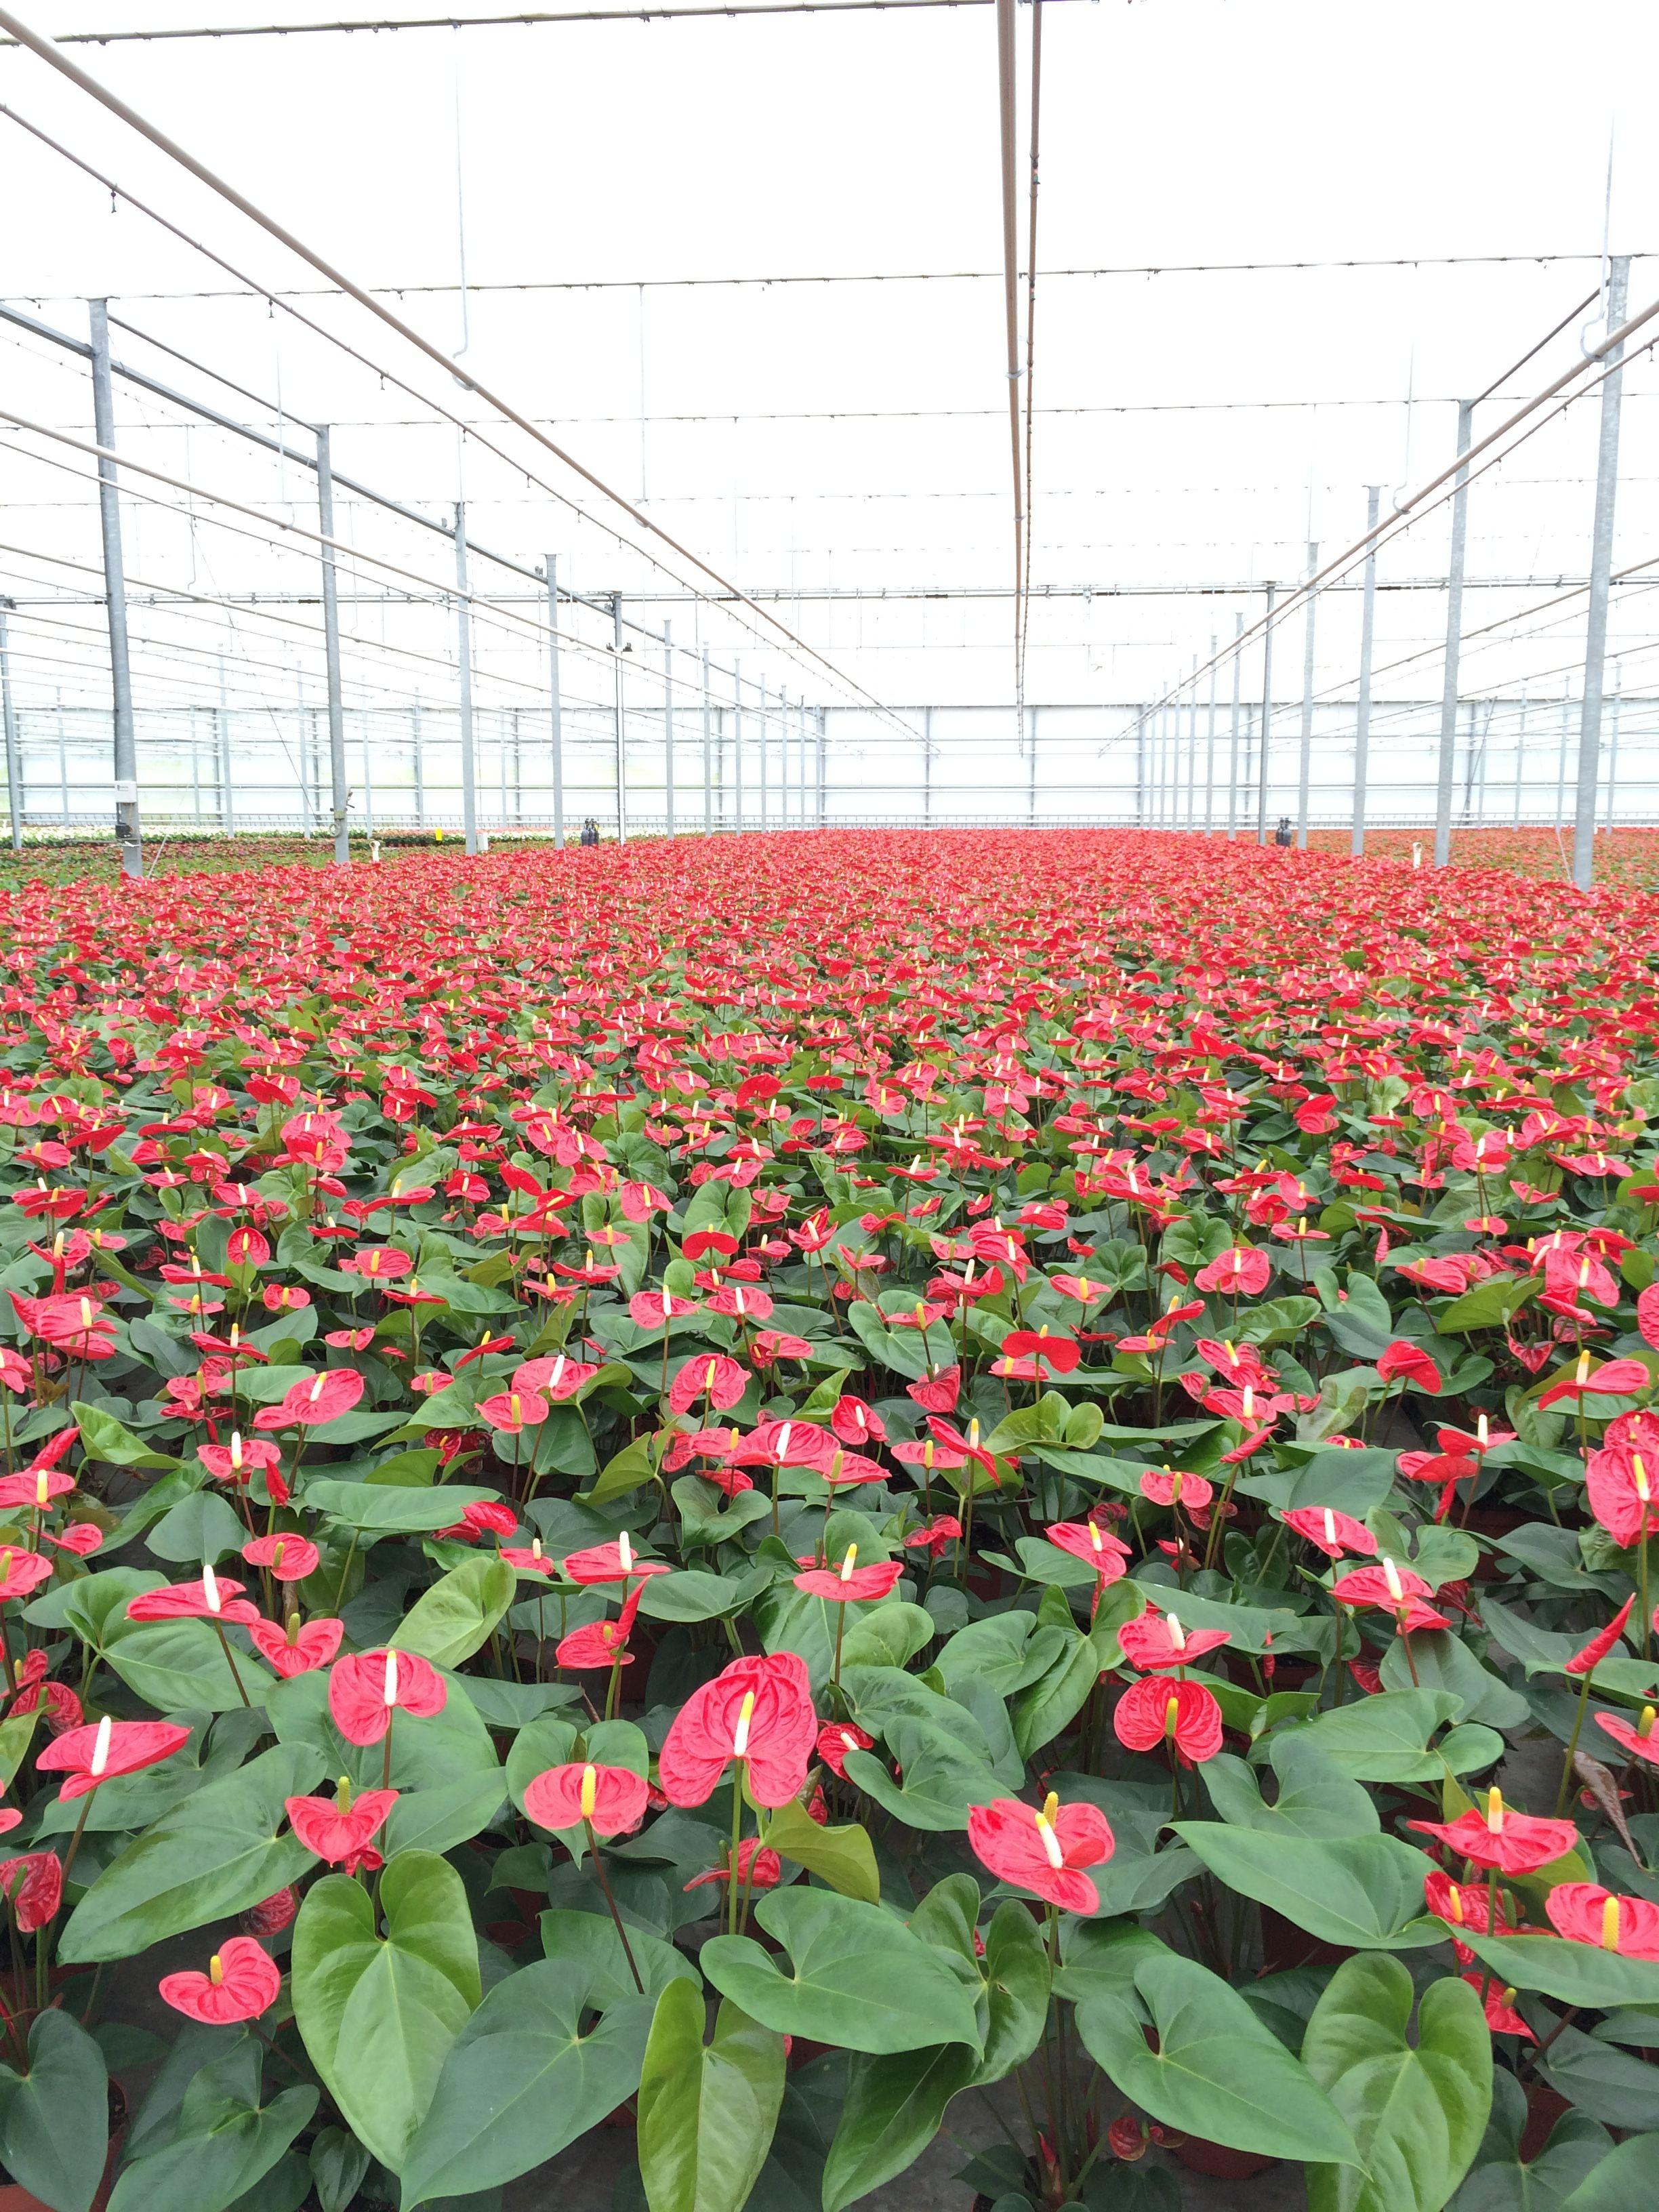 Anthurium Nursery In Holland Plants Anthurium Planting Flowers